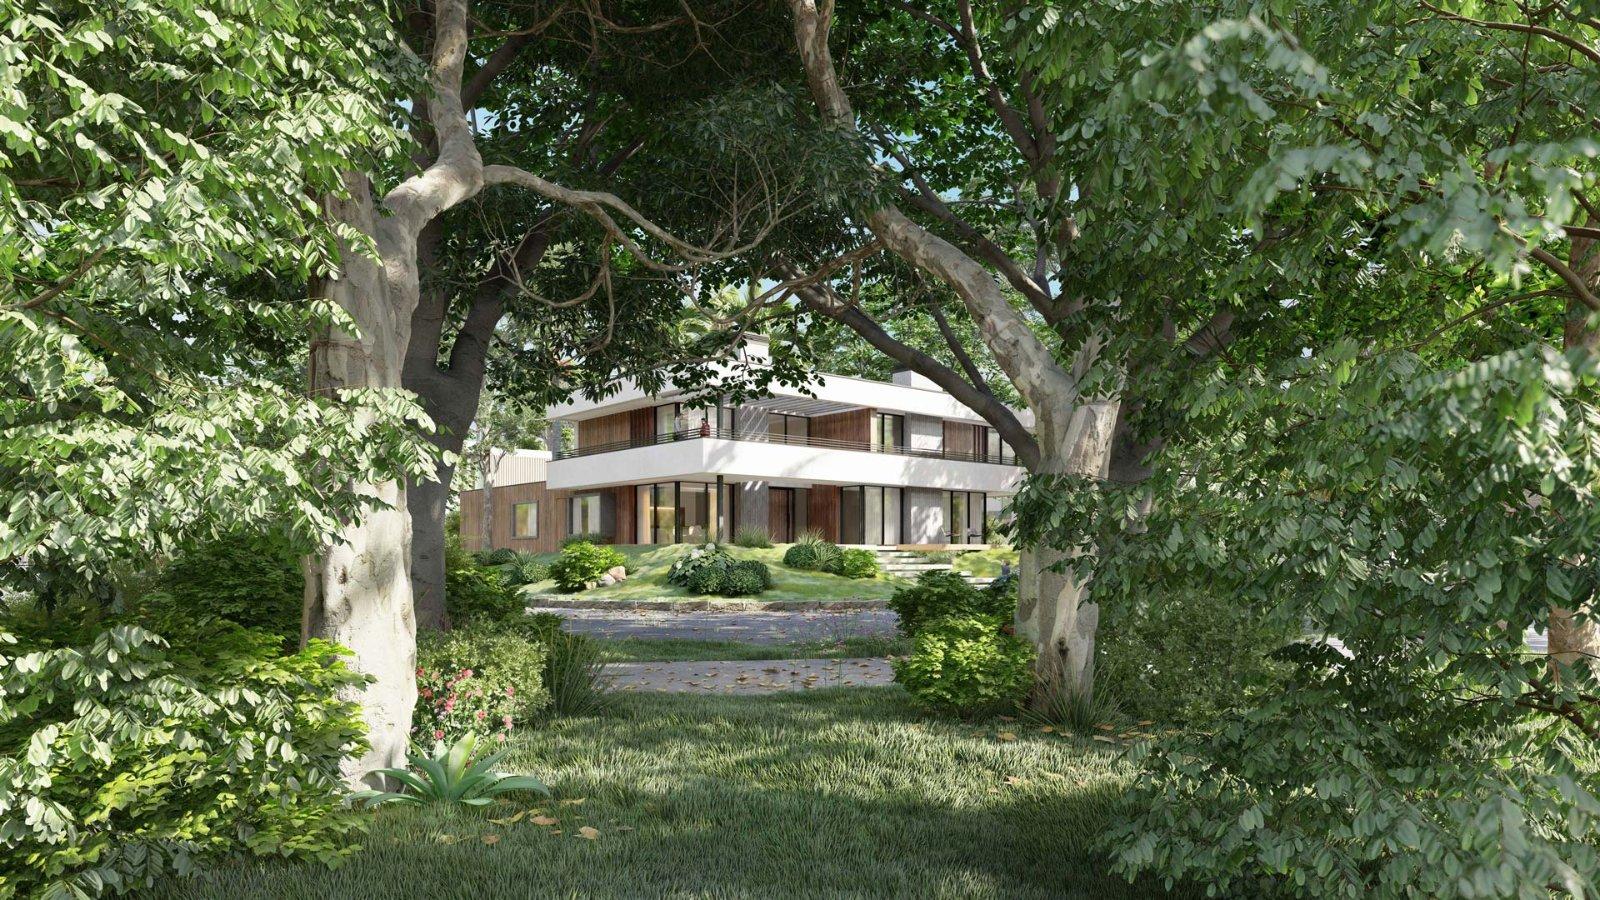 Residential-Exterior-Van-Manen-1920x1080_Lumion10.jpg